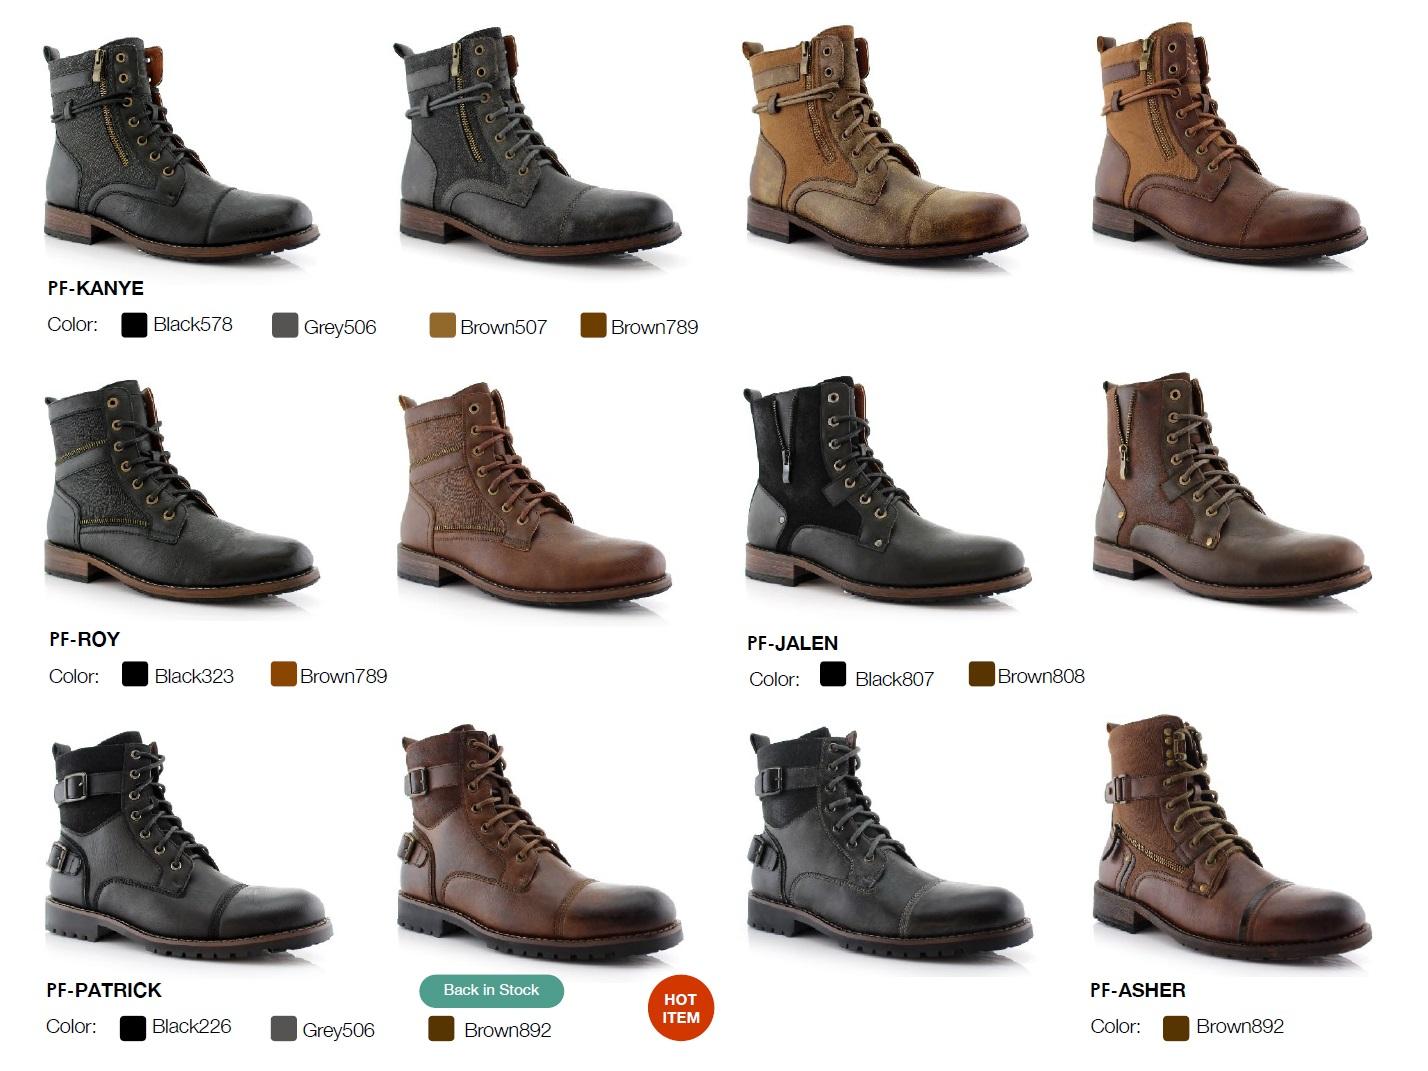 Nantlis Vol 43 Zapatos para Hombres Mayoreo Wholesale men shoes Catalogo Polar Fox Footwear_Page_10